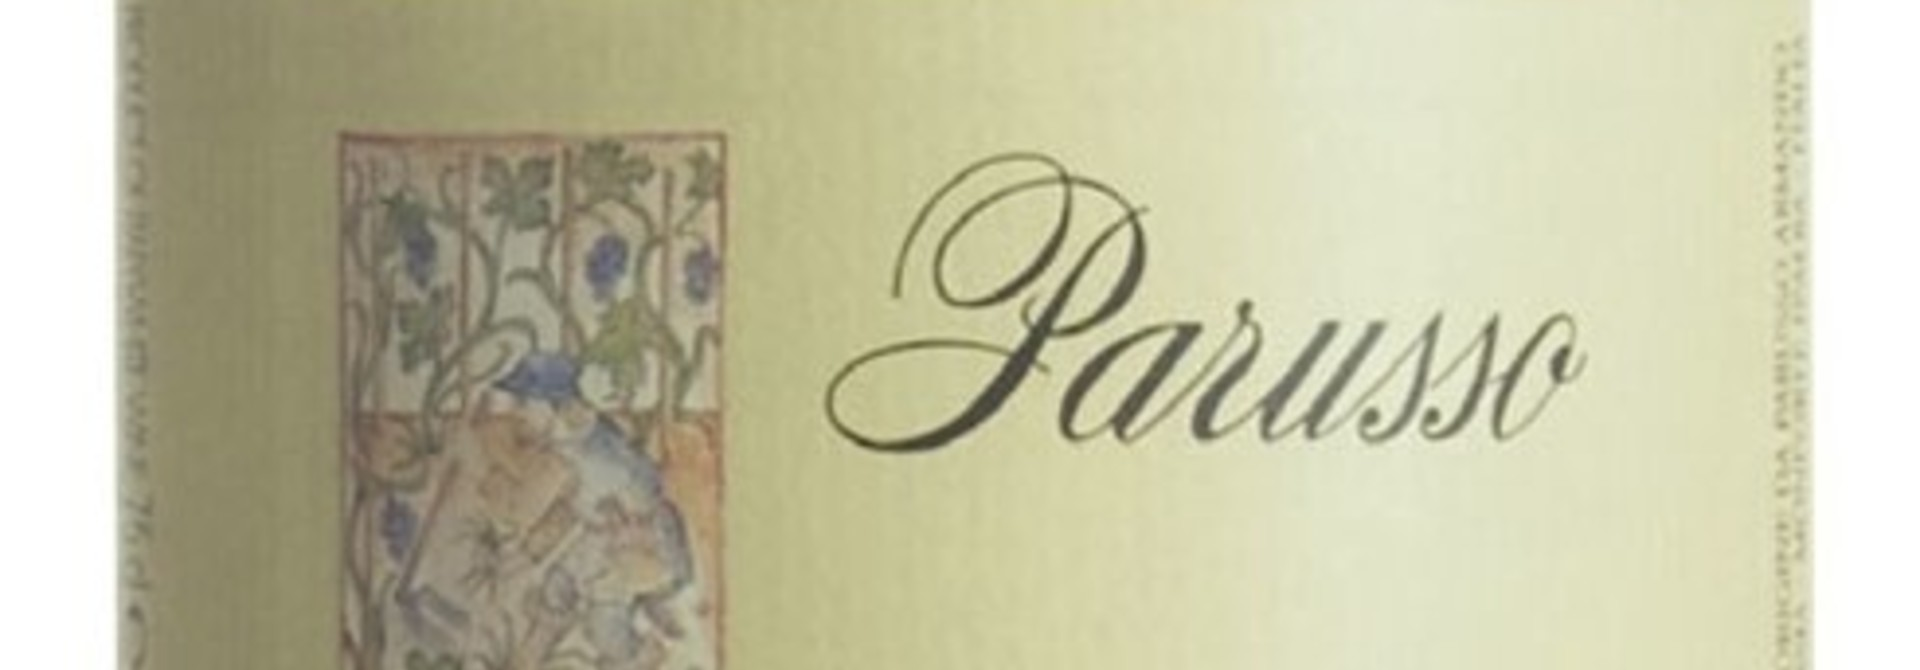 Parusso Langhe Bianco, Rovella 2018